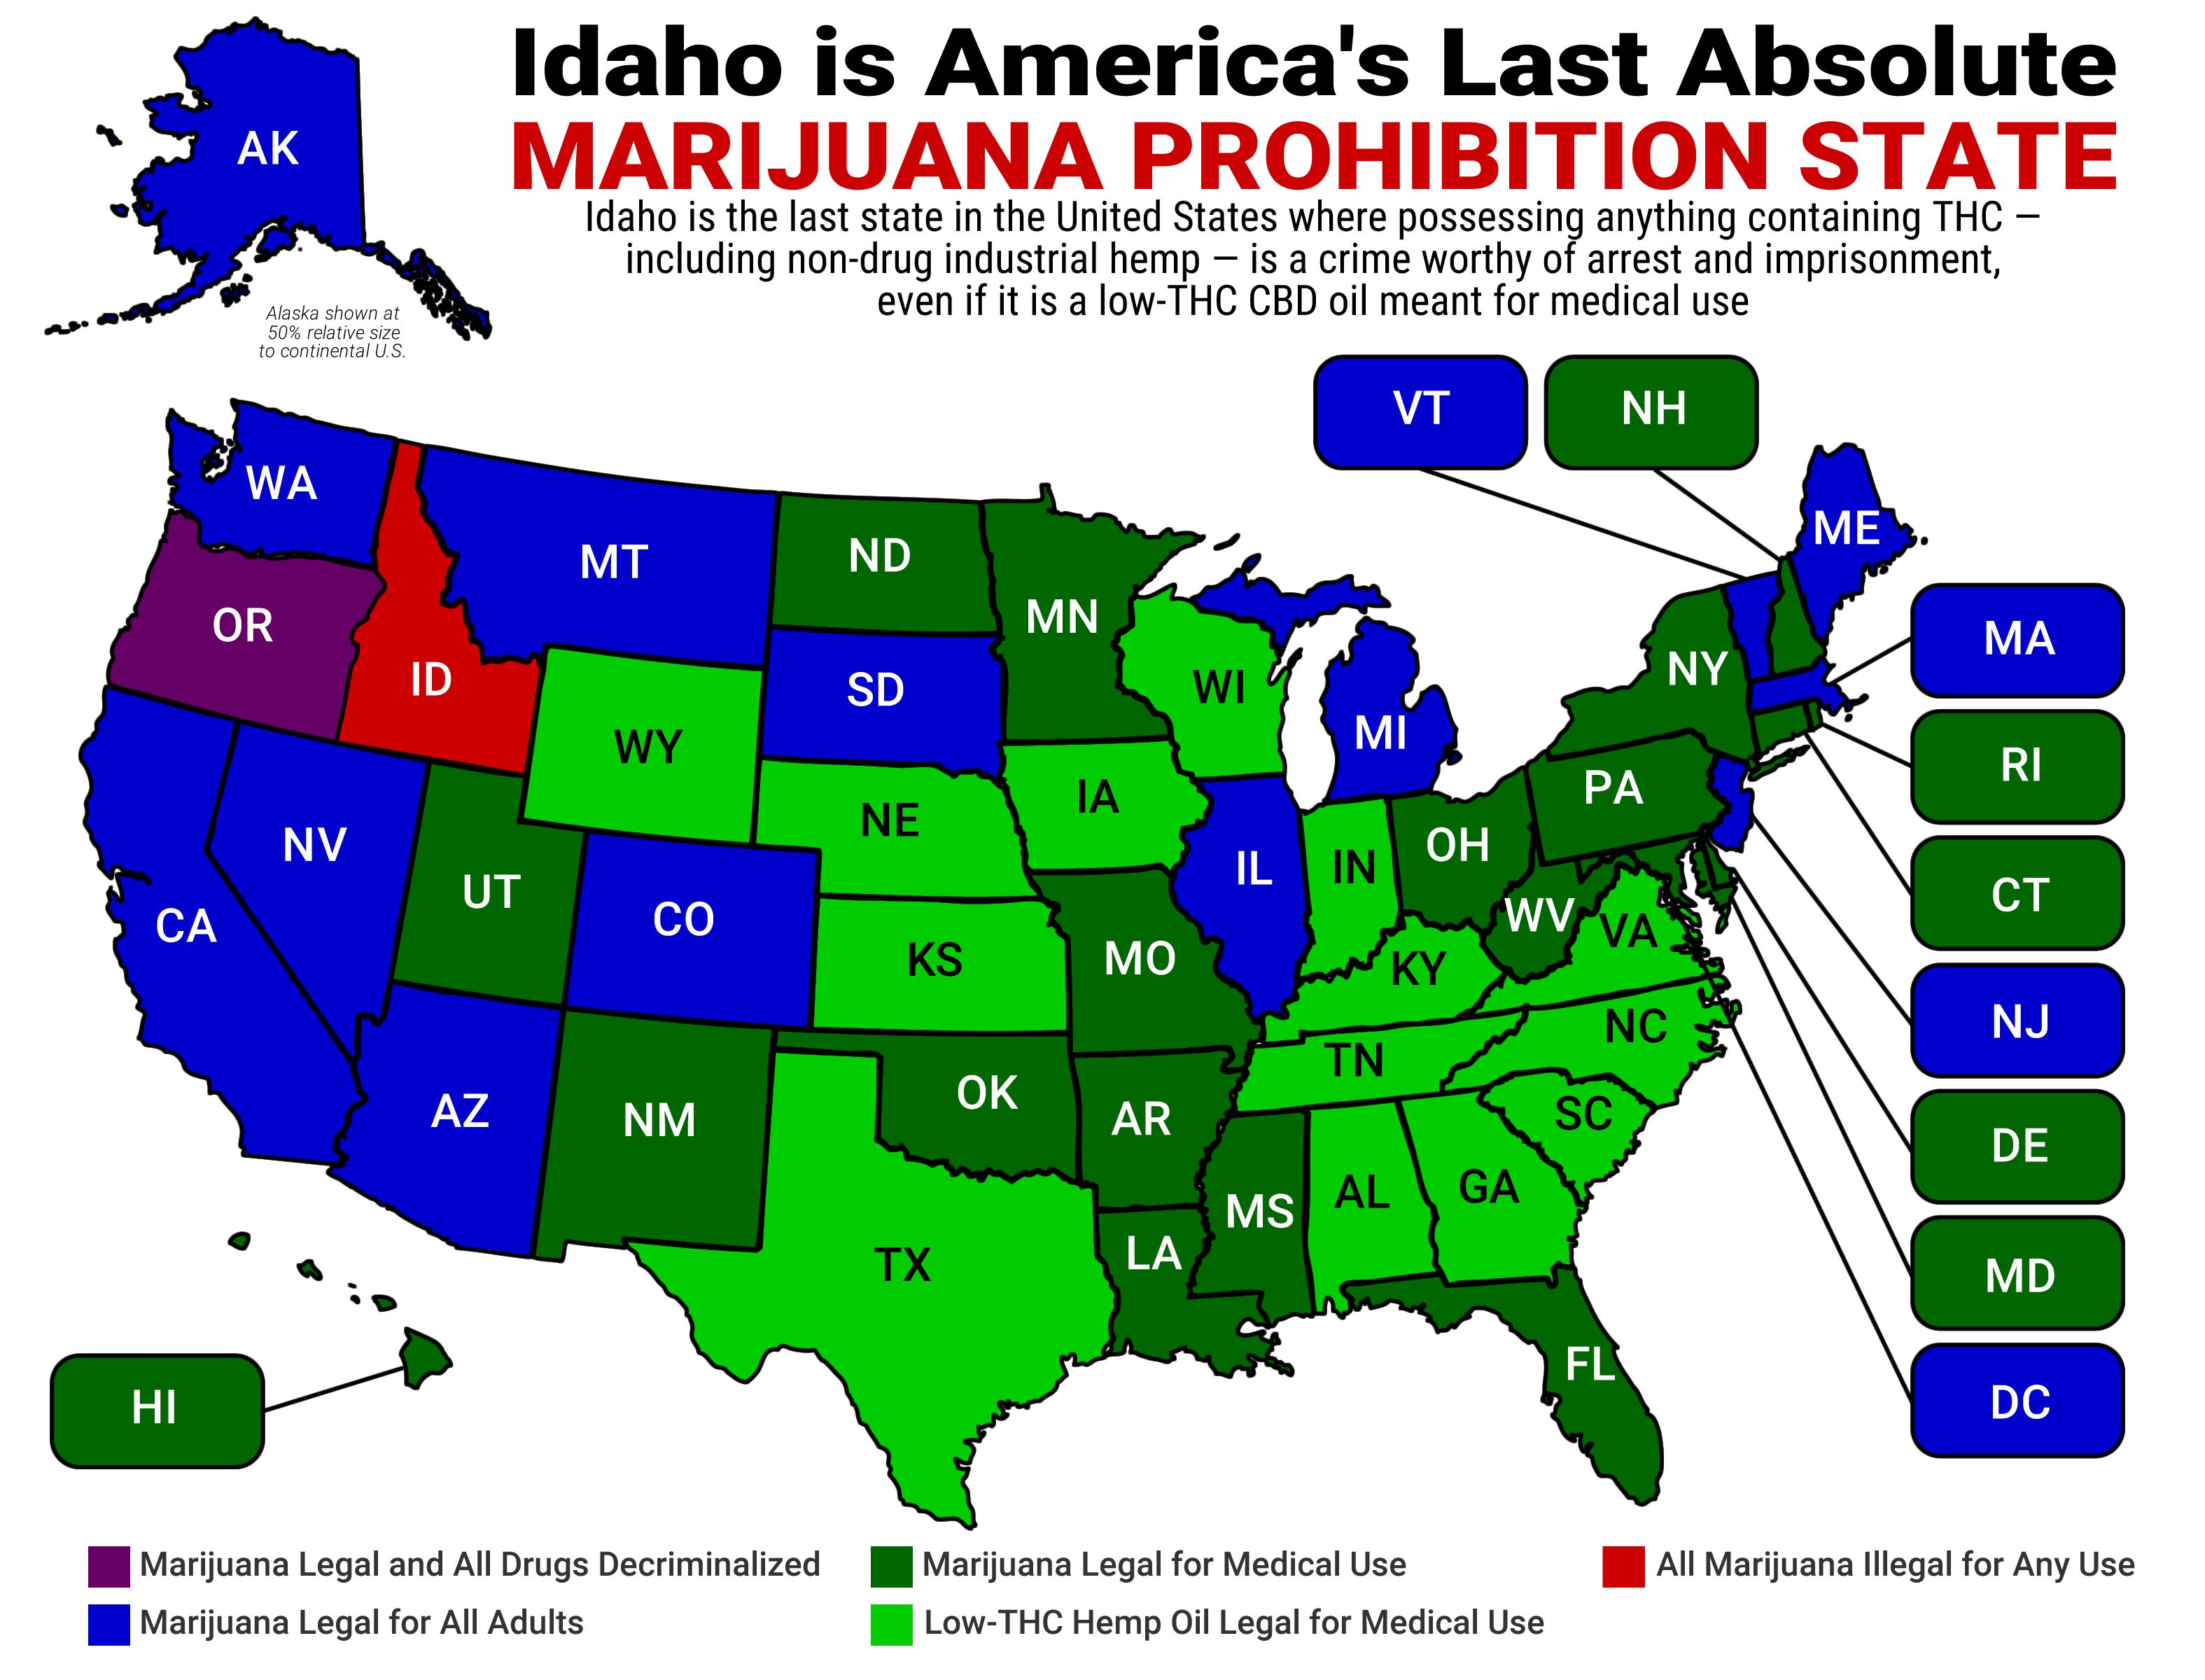 Map of state marijuana laws